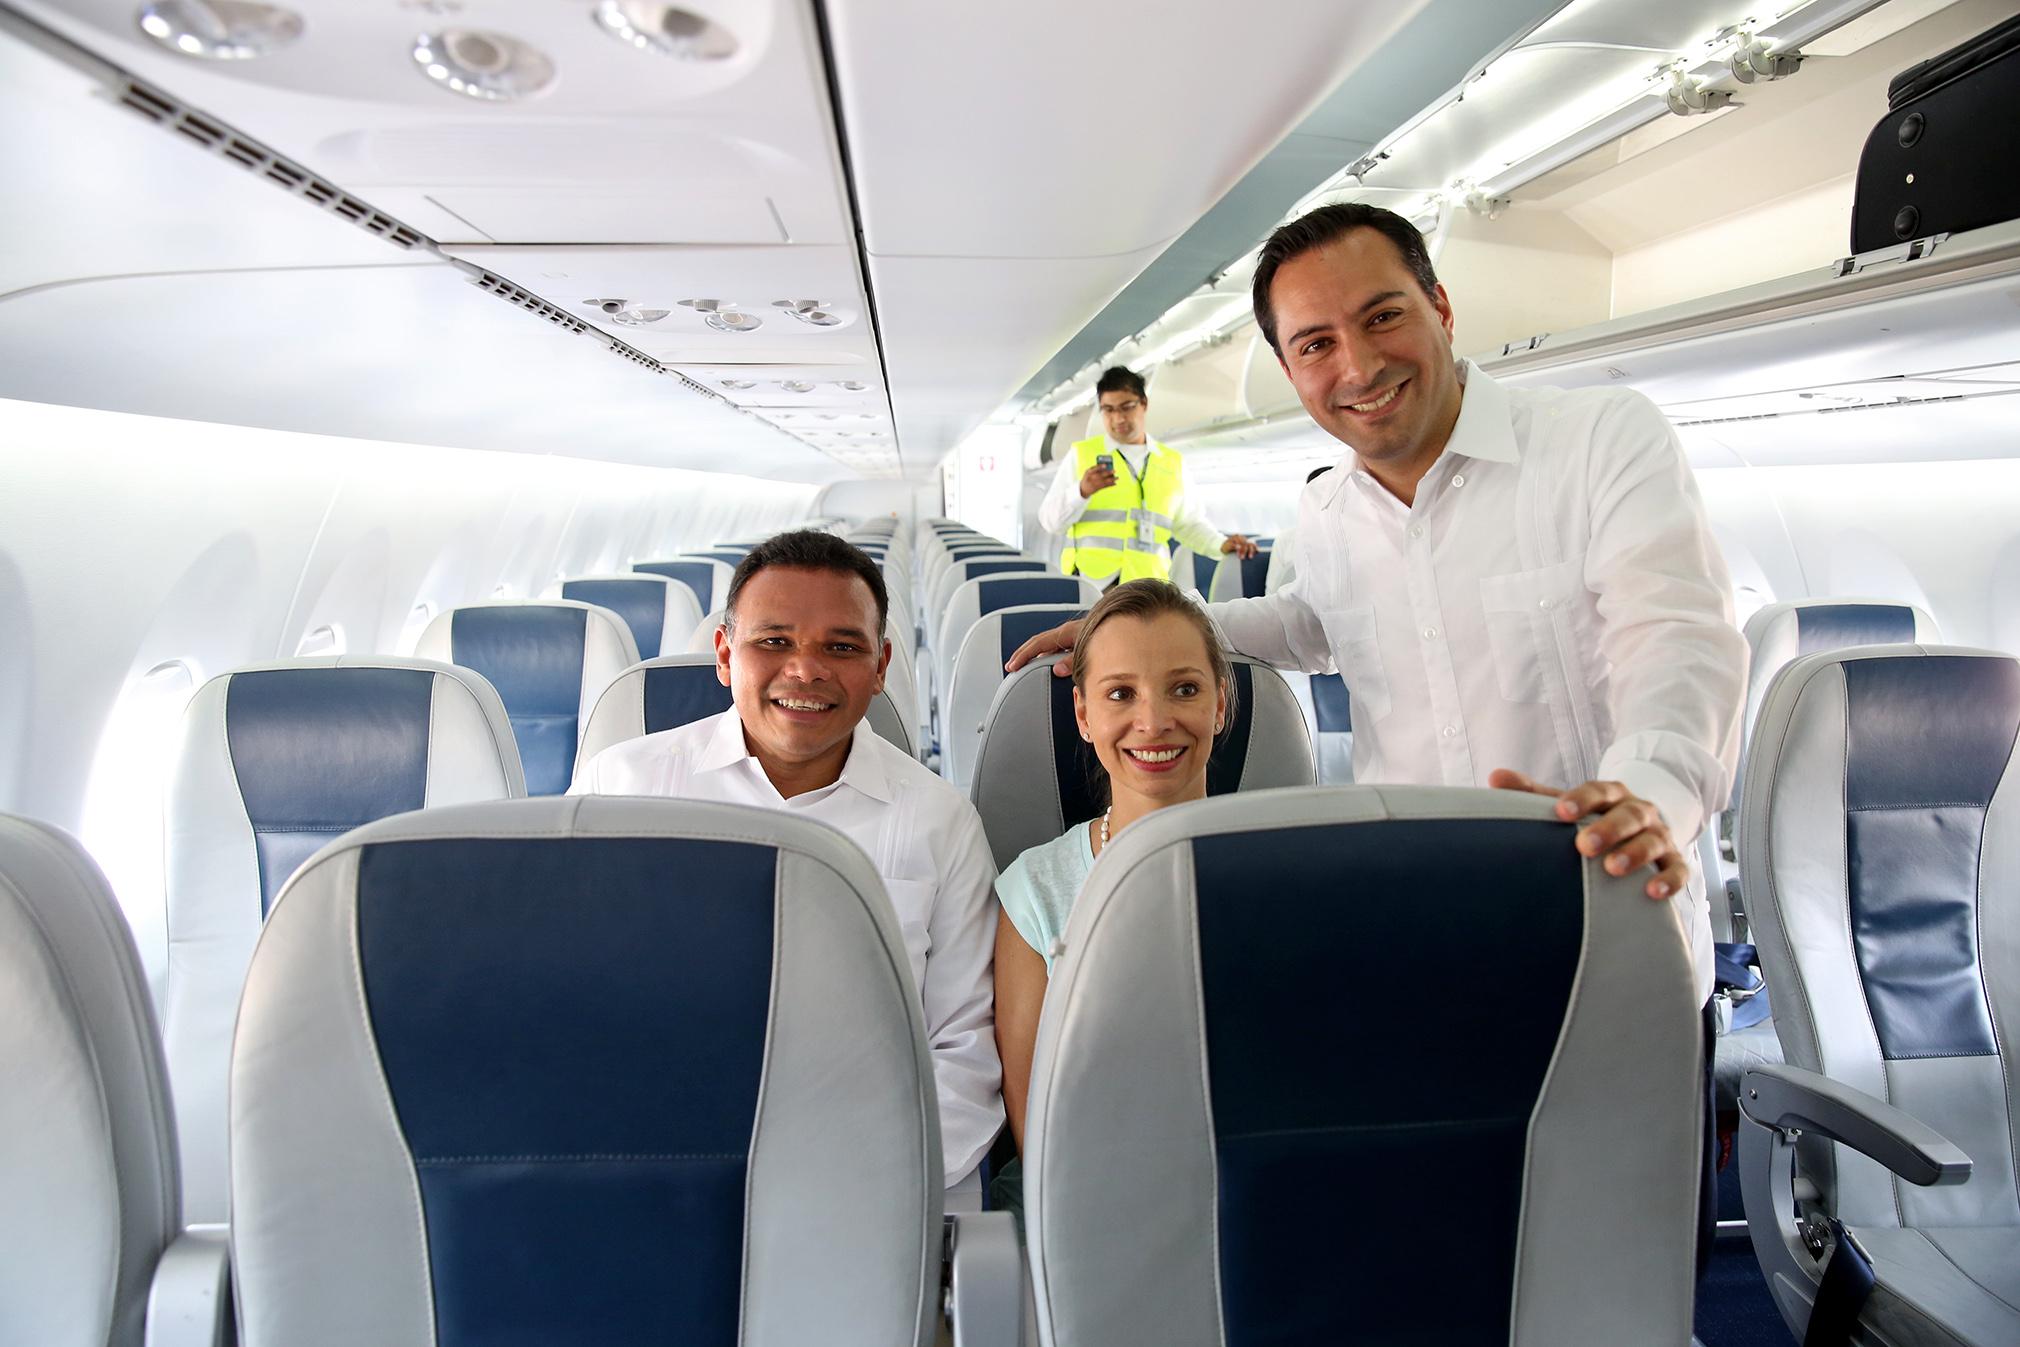 Abren nuevo vuelo La Habana-Mérida-La Habana